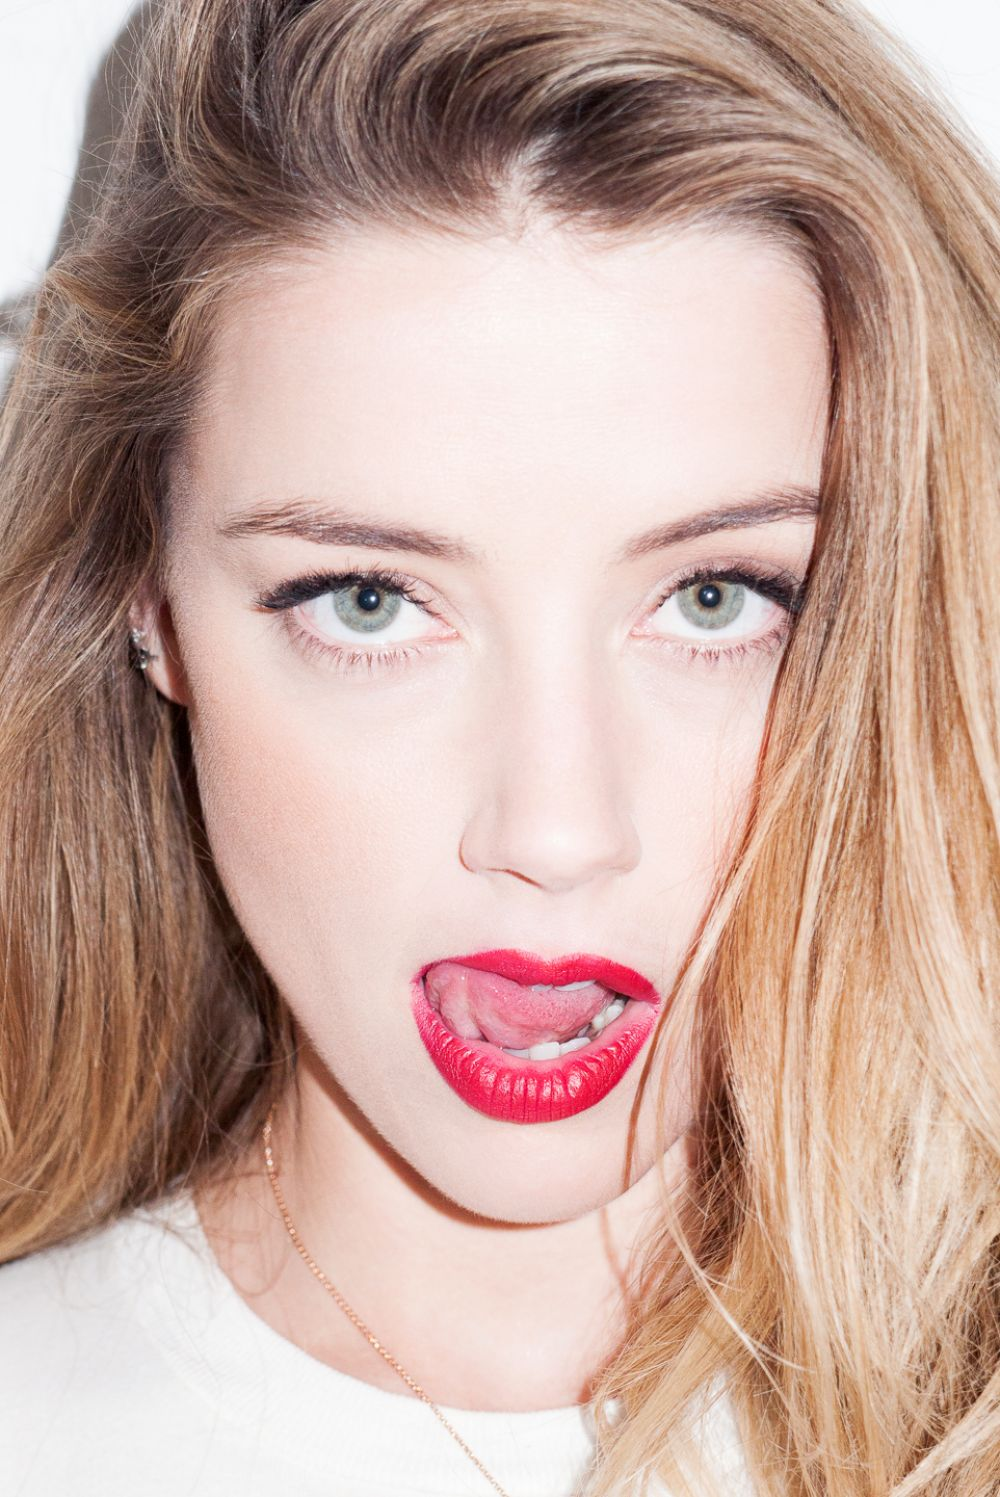 Amber Heard Hot Photoshoot by Terry Richardson